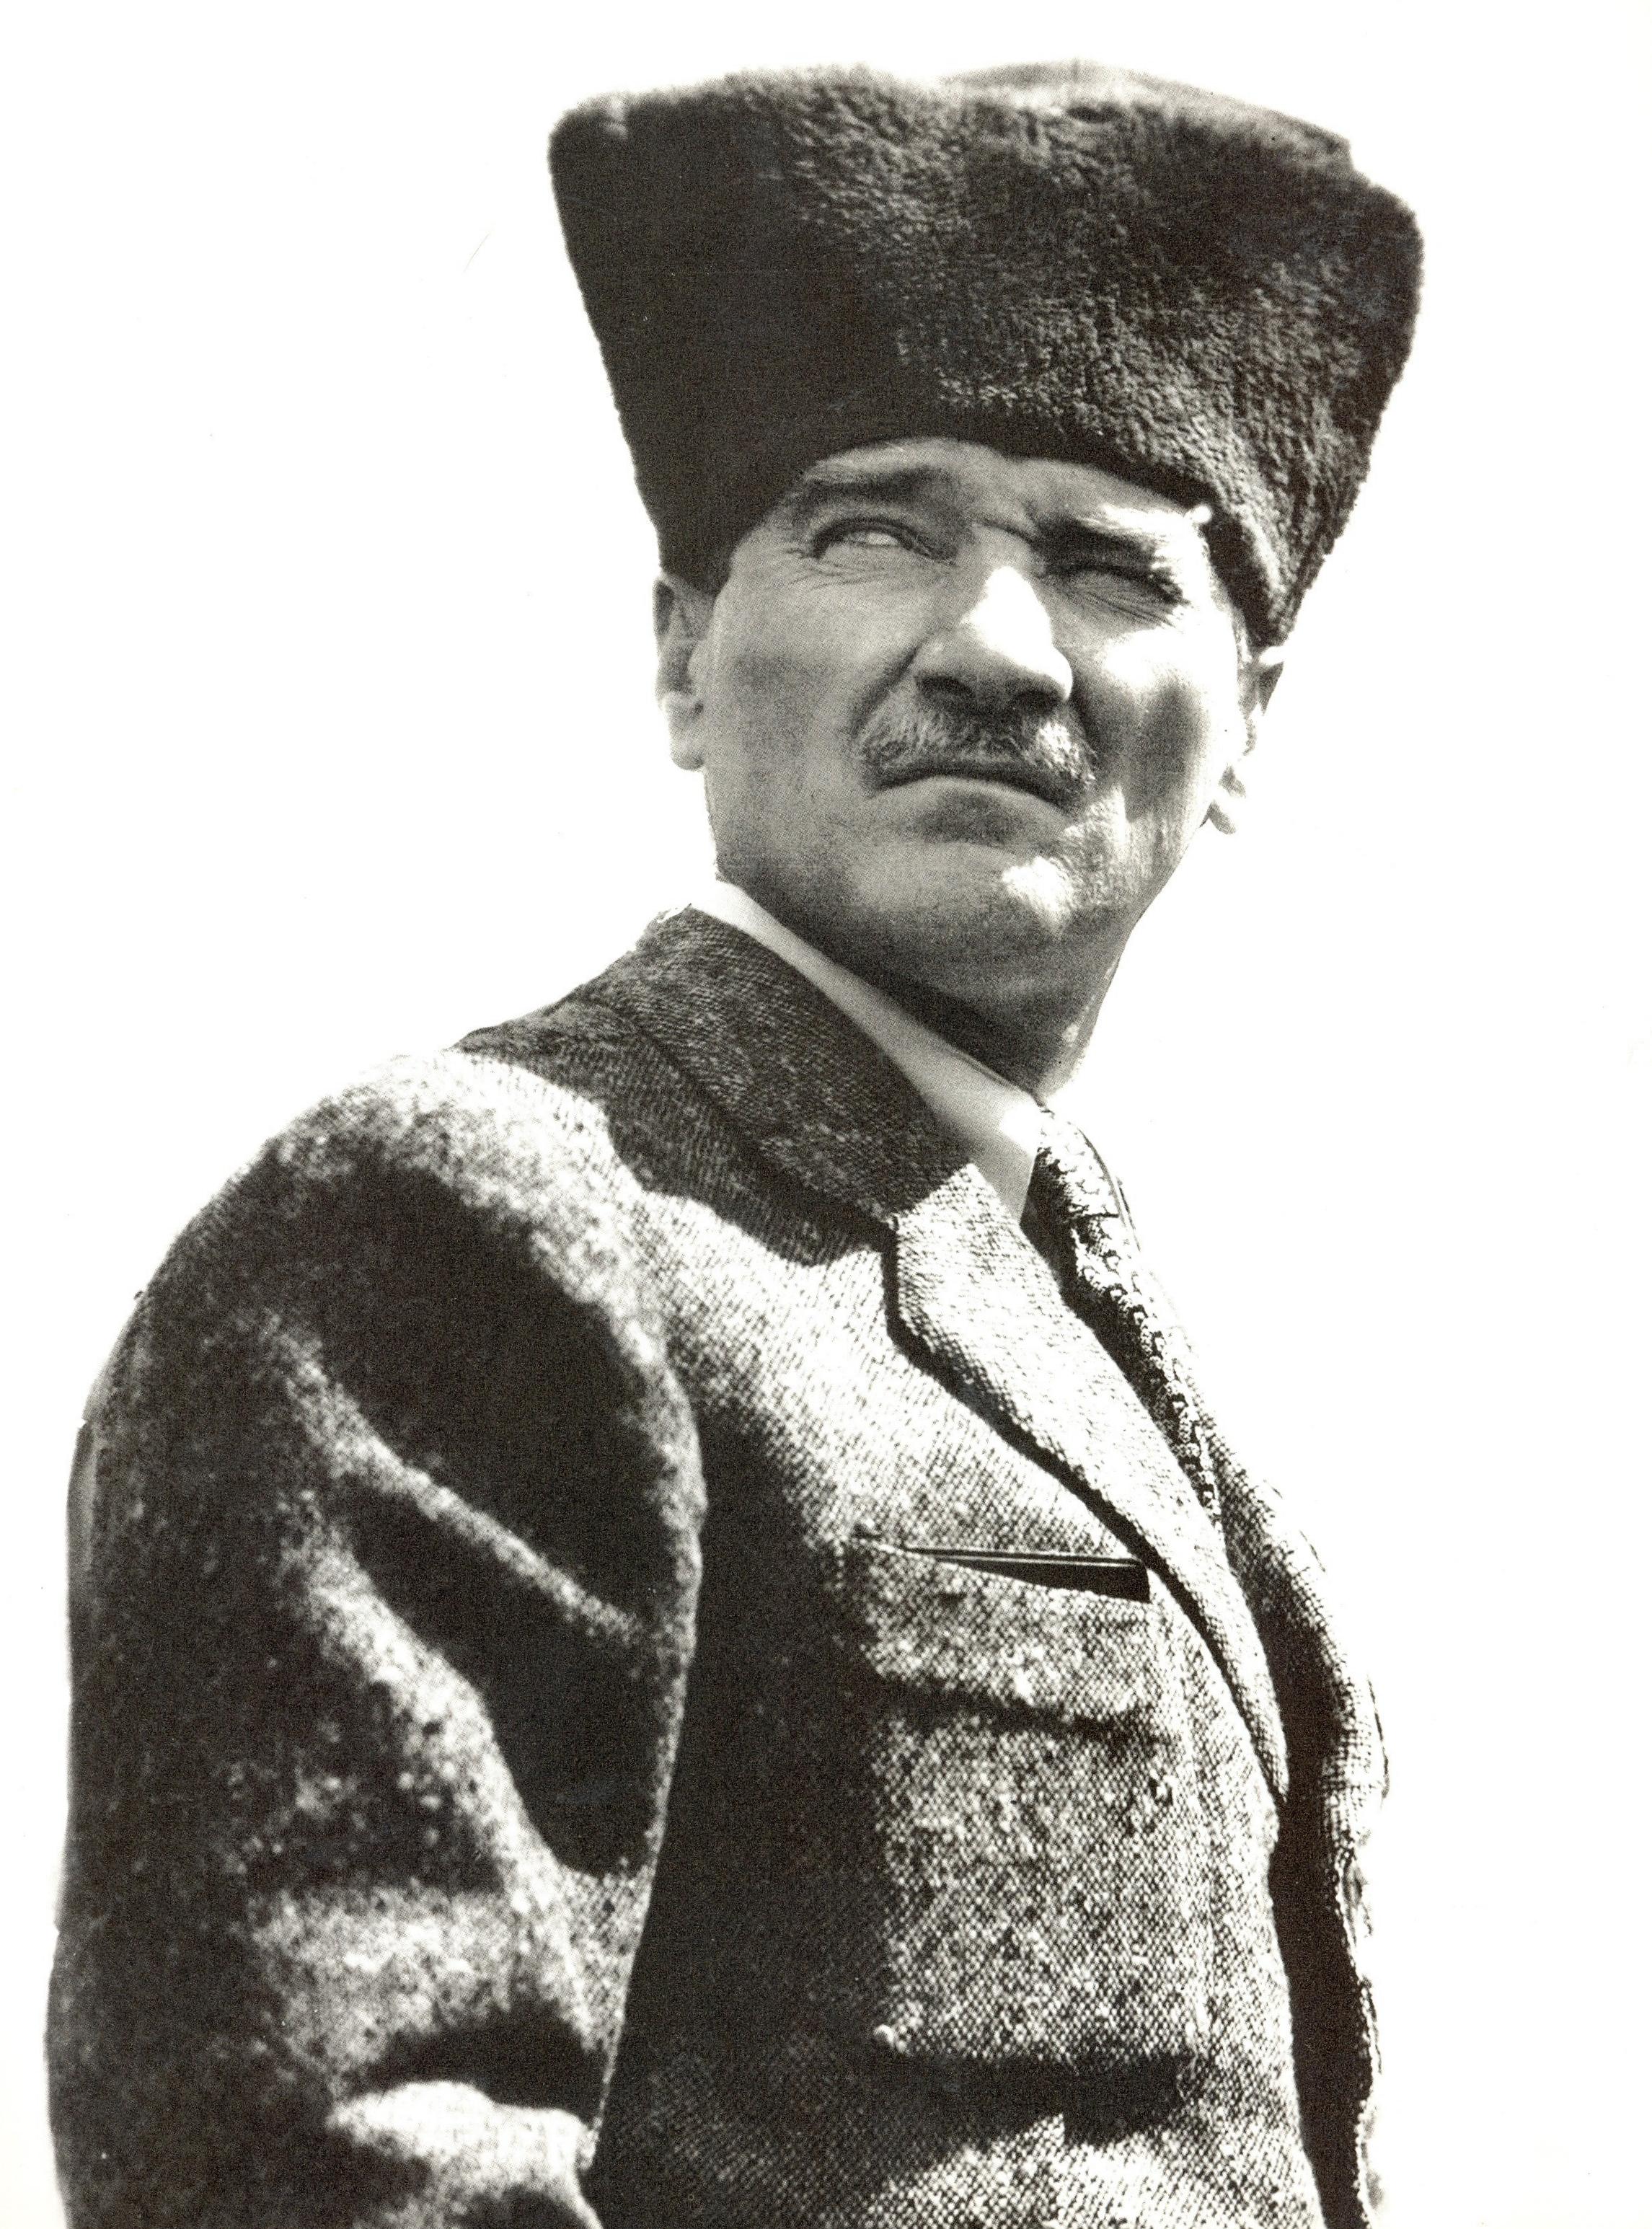 File:Mustafa Kemal Atatürk.png.